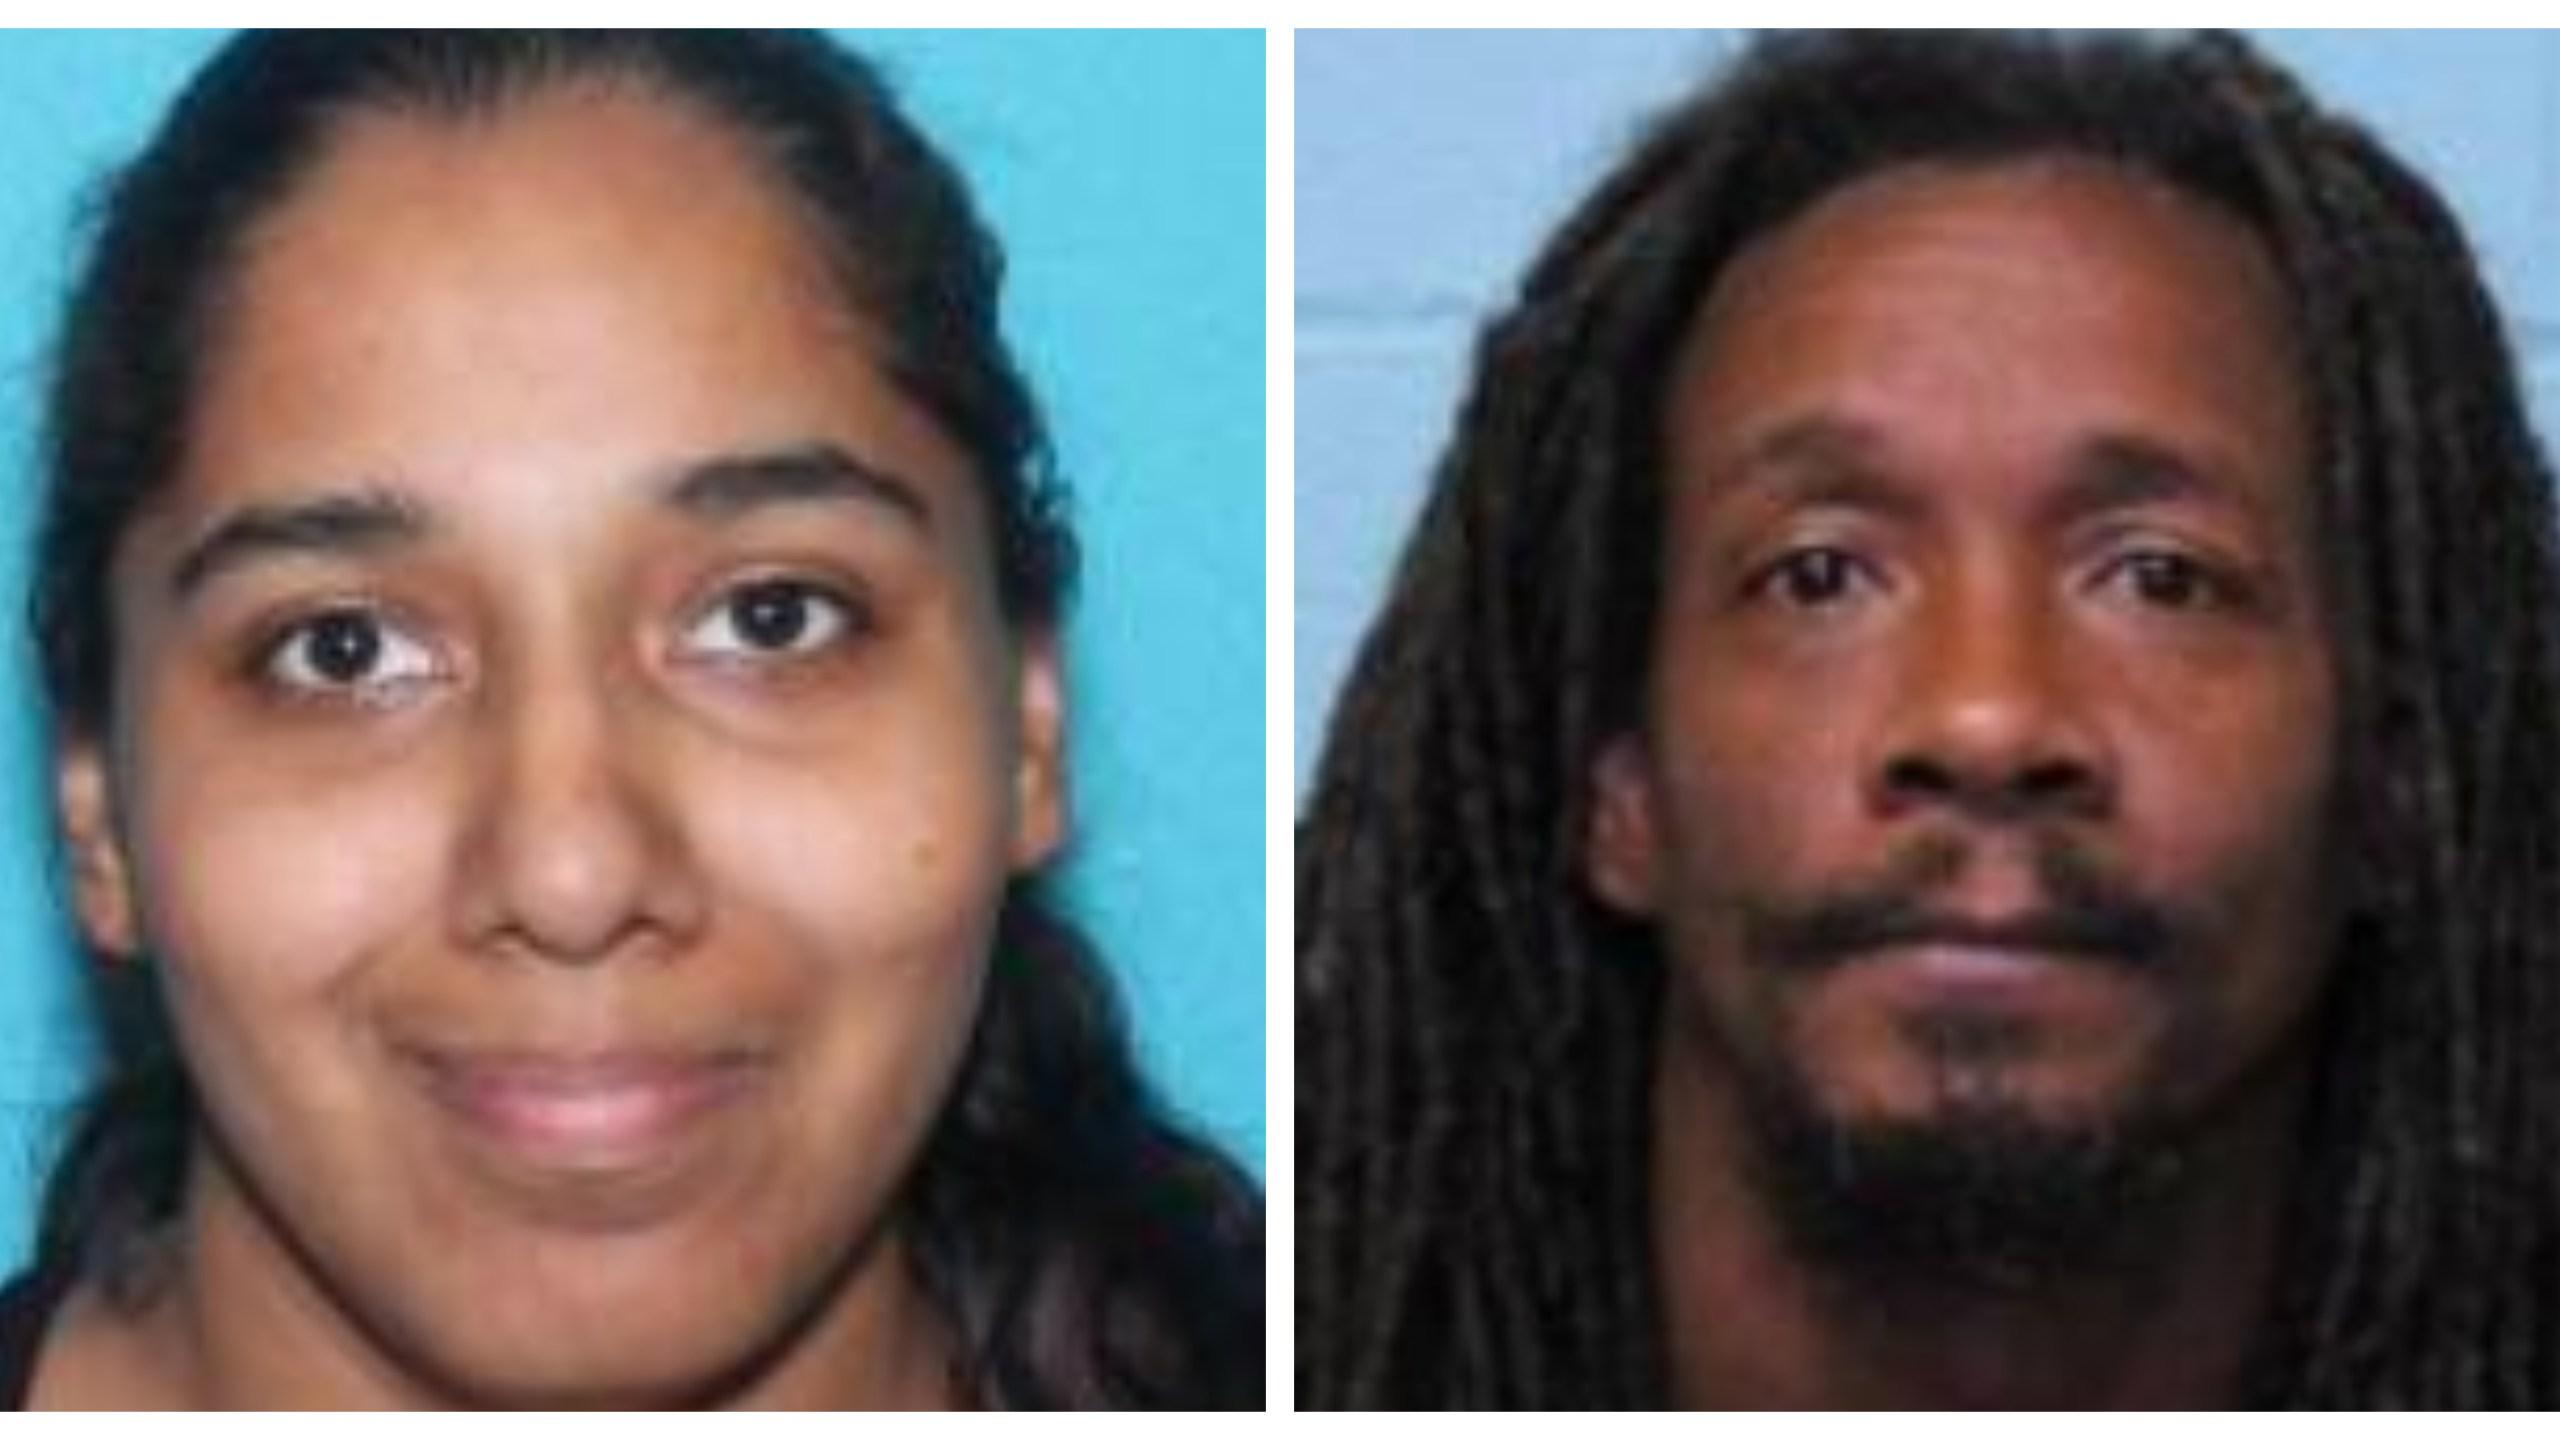 Police arrest 2 after woman dies due to apparent drug